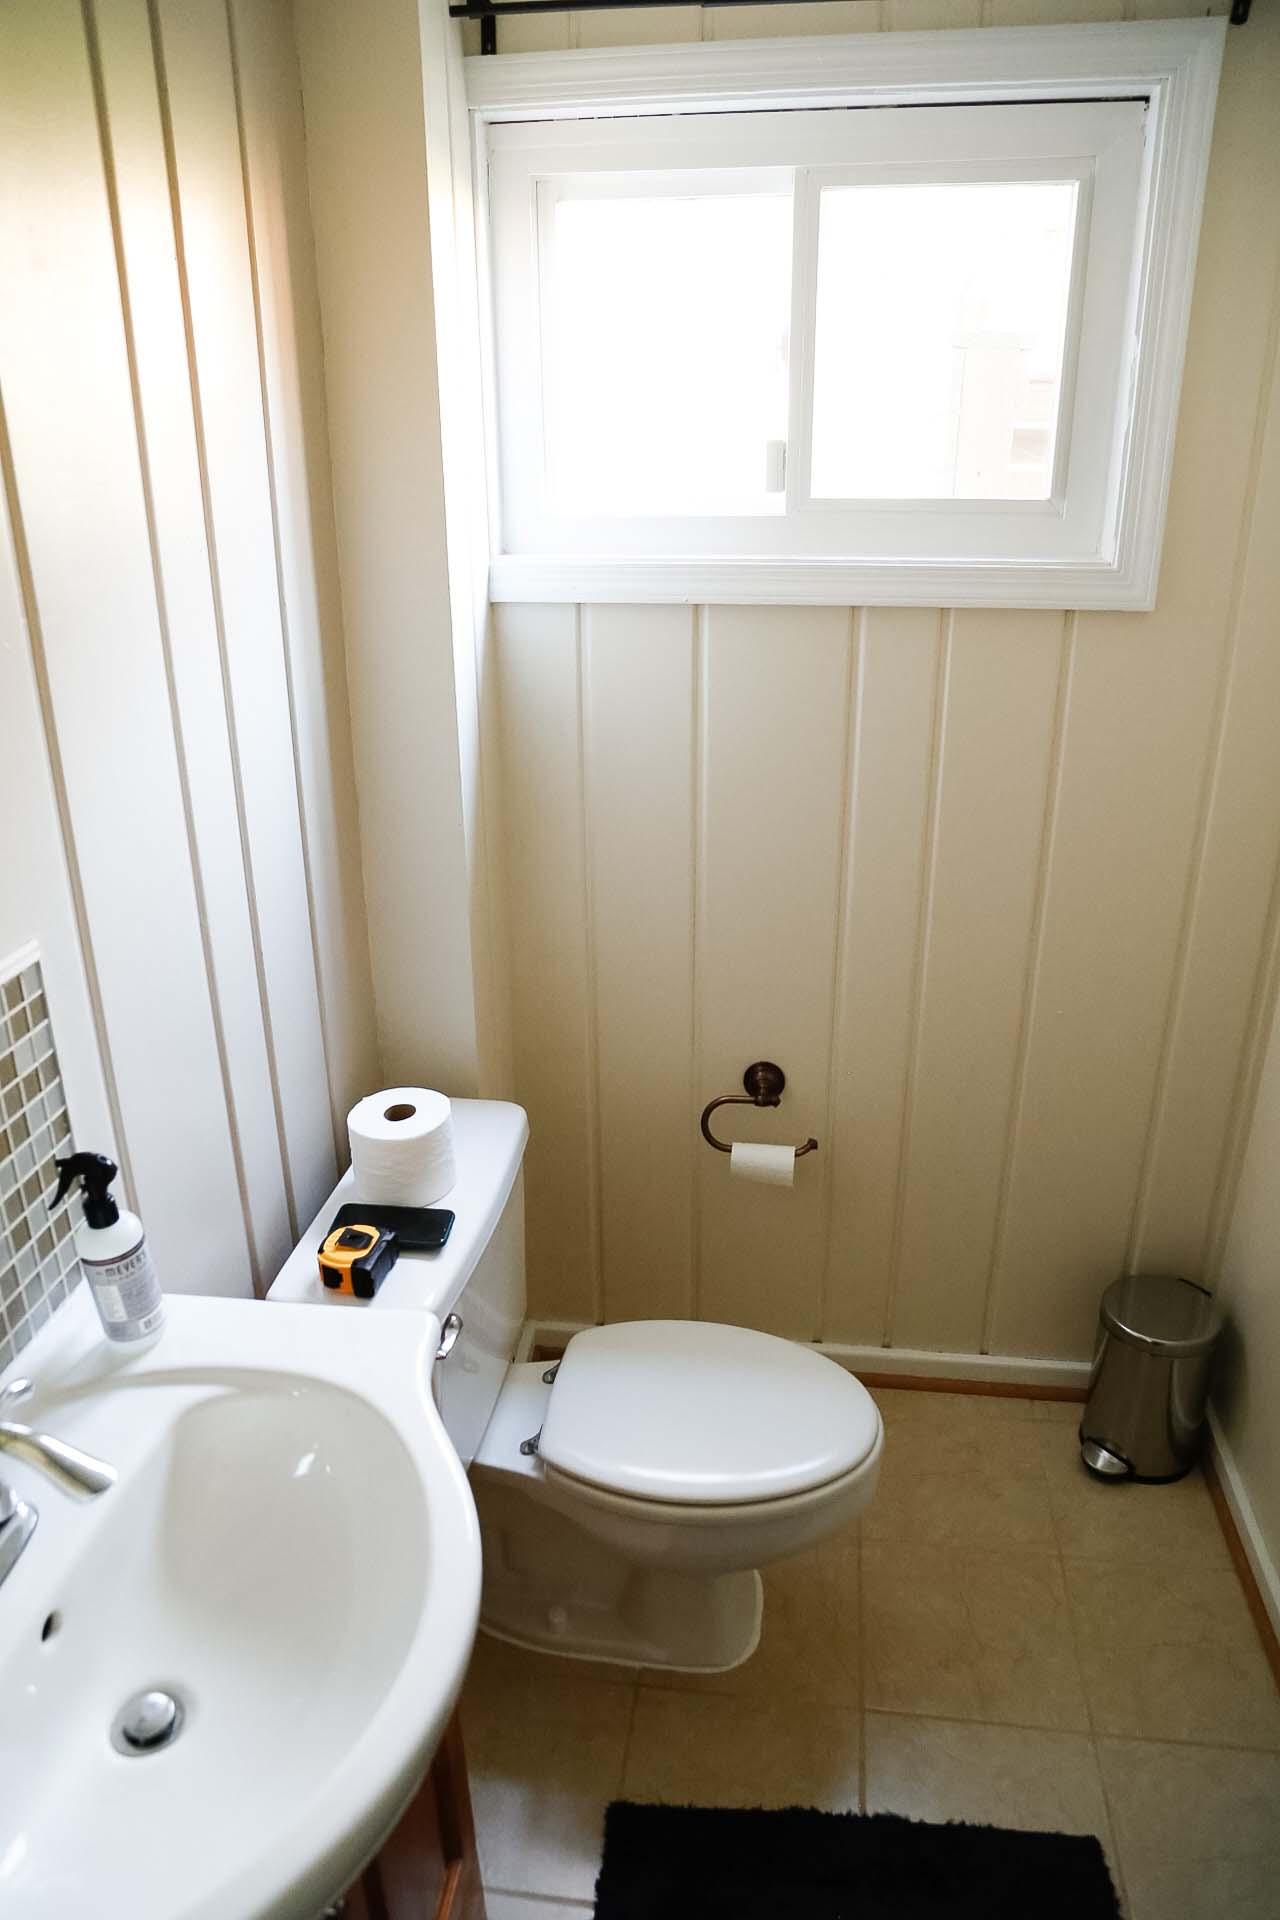 Bathroom knotty pine